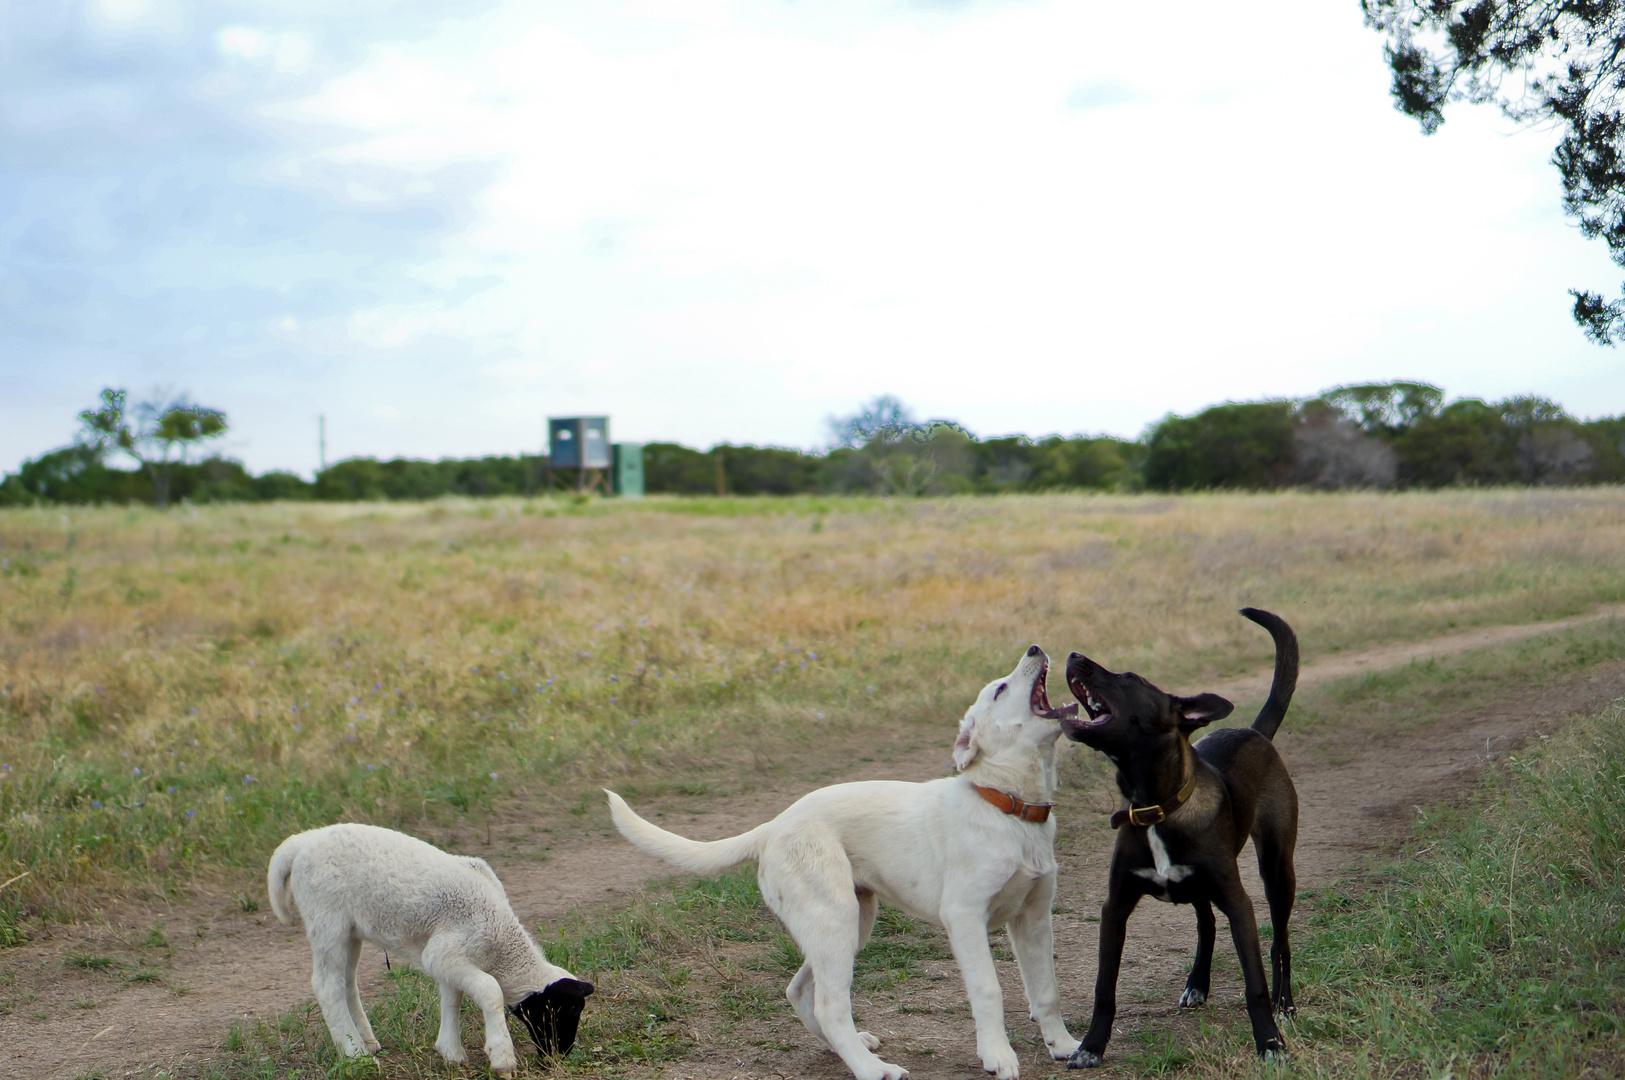 dogs and sheep // hunde und schaf